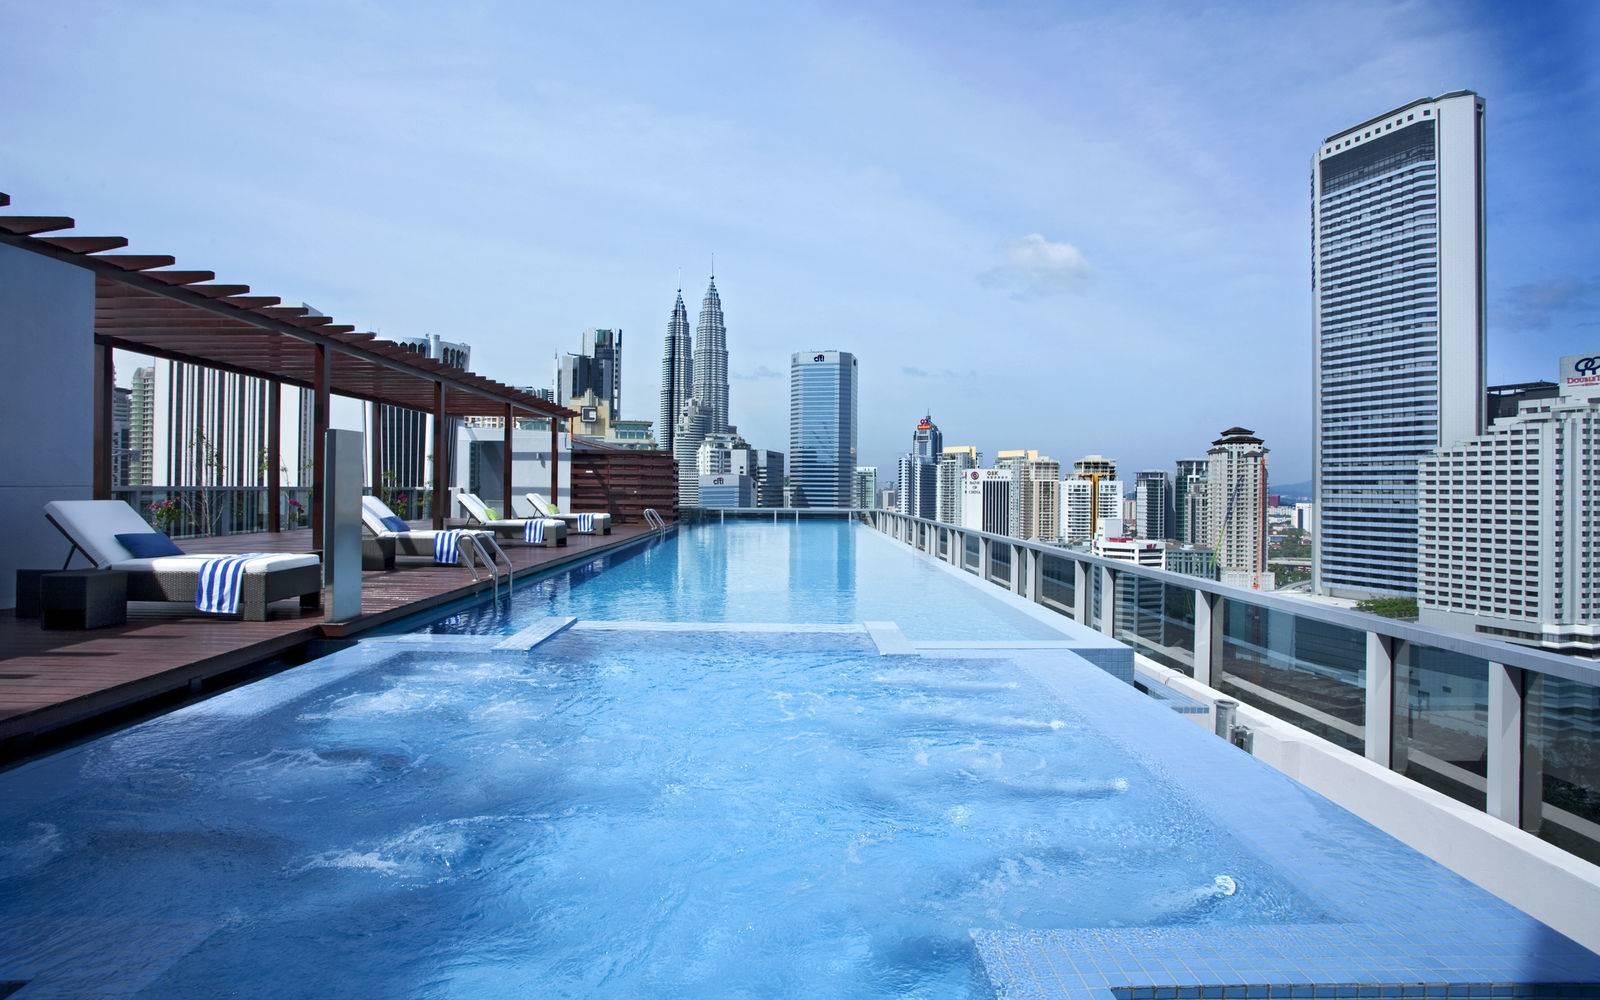 Somerset rooftop pool